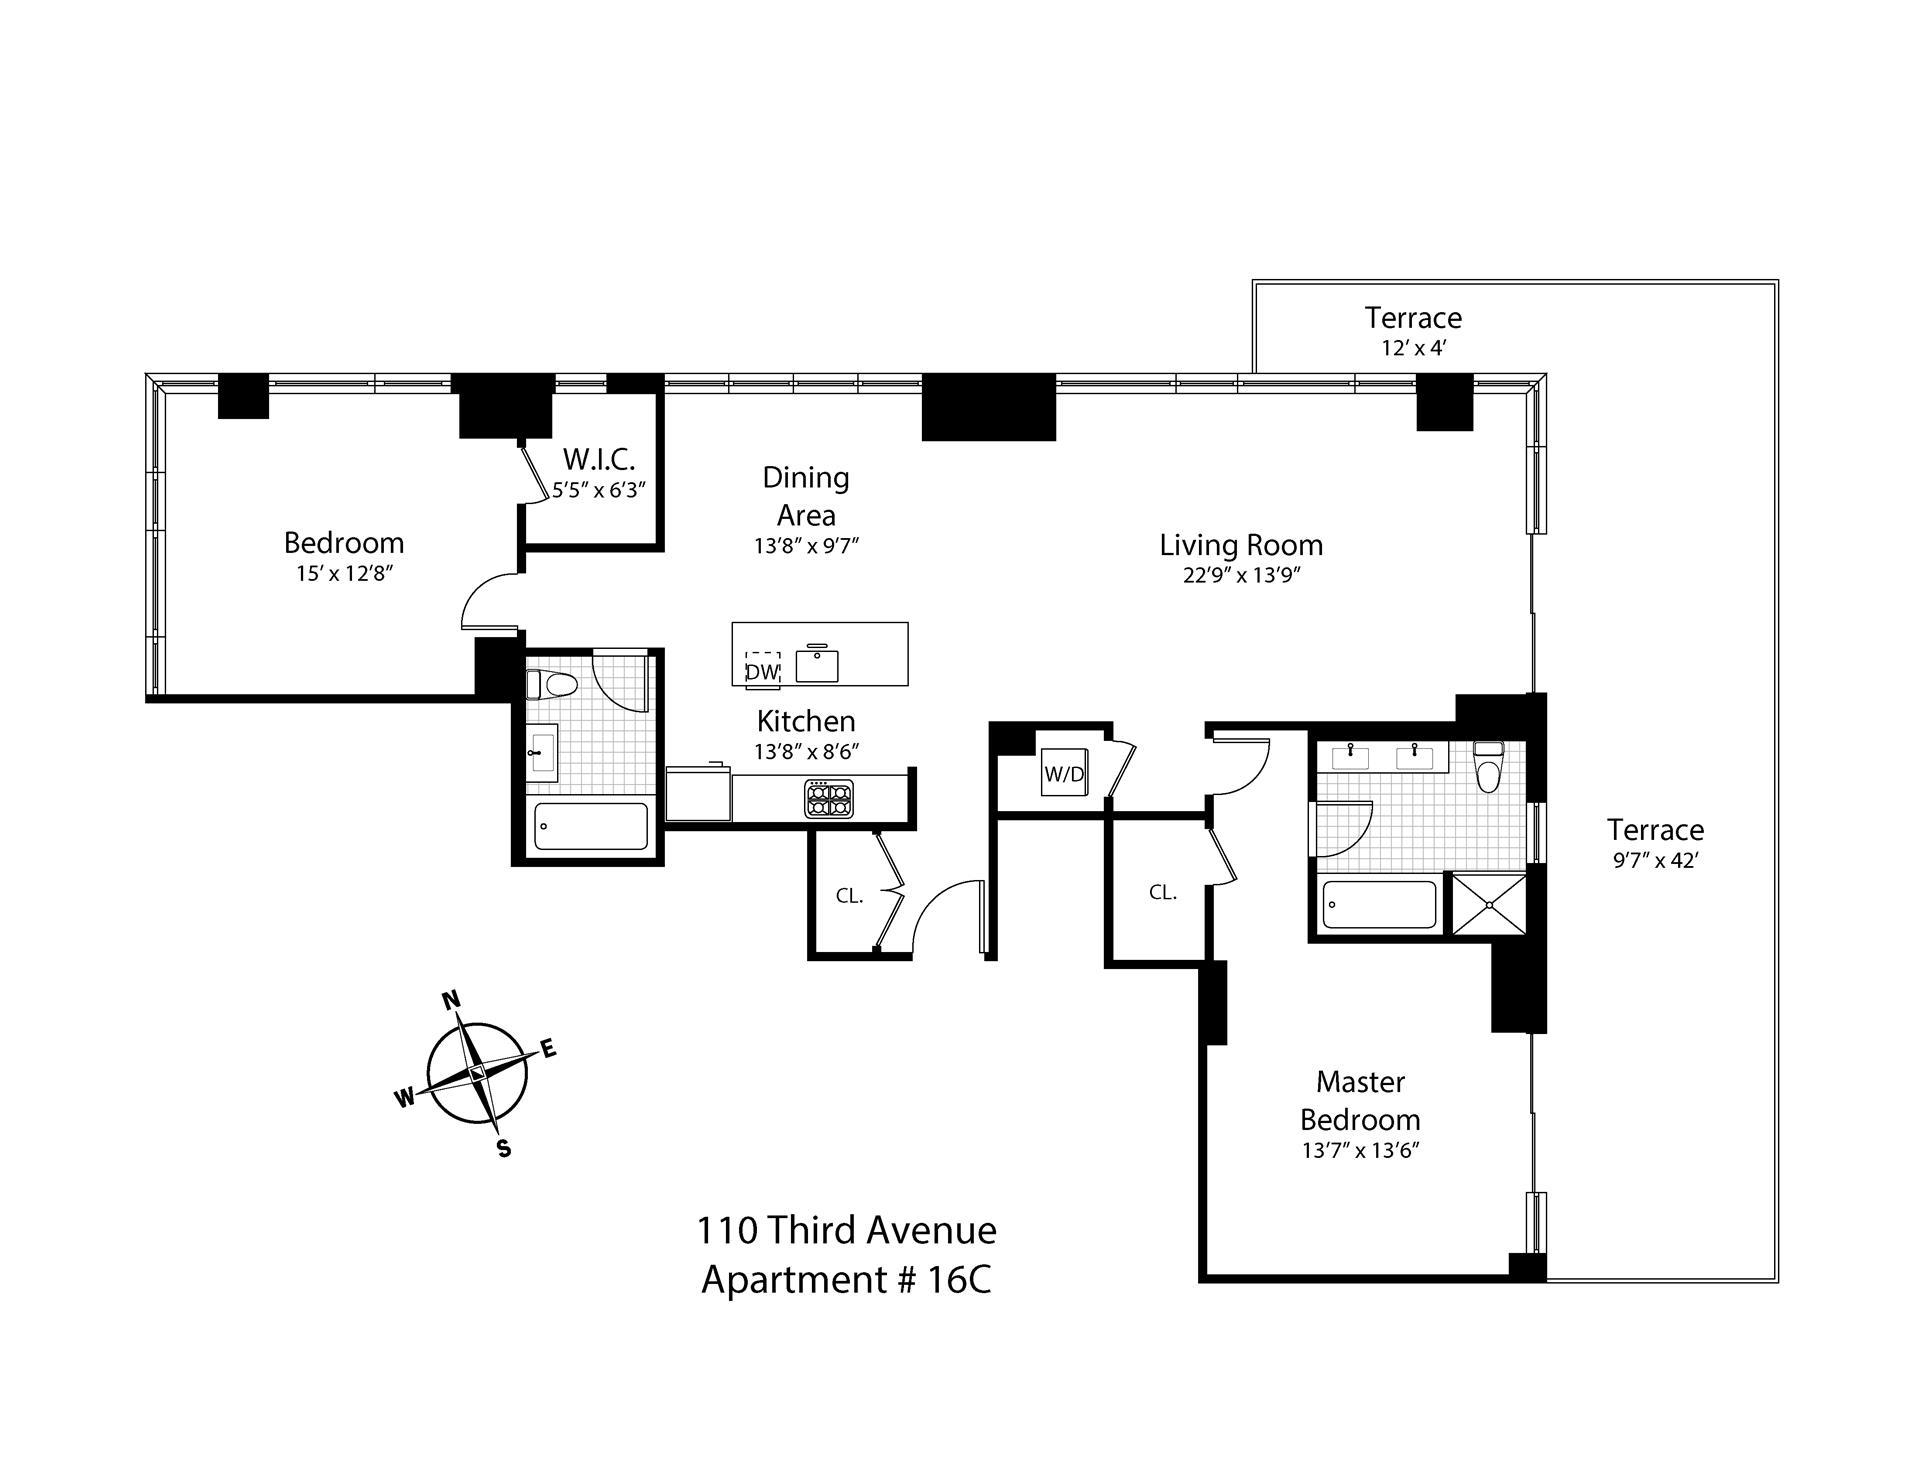 Floor plan of ONE TEN 3RD, 110 Third Avenue, 16C - East Village, New York